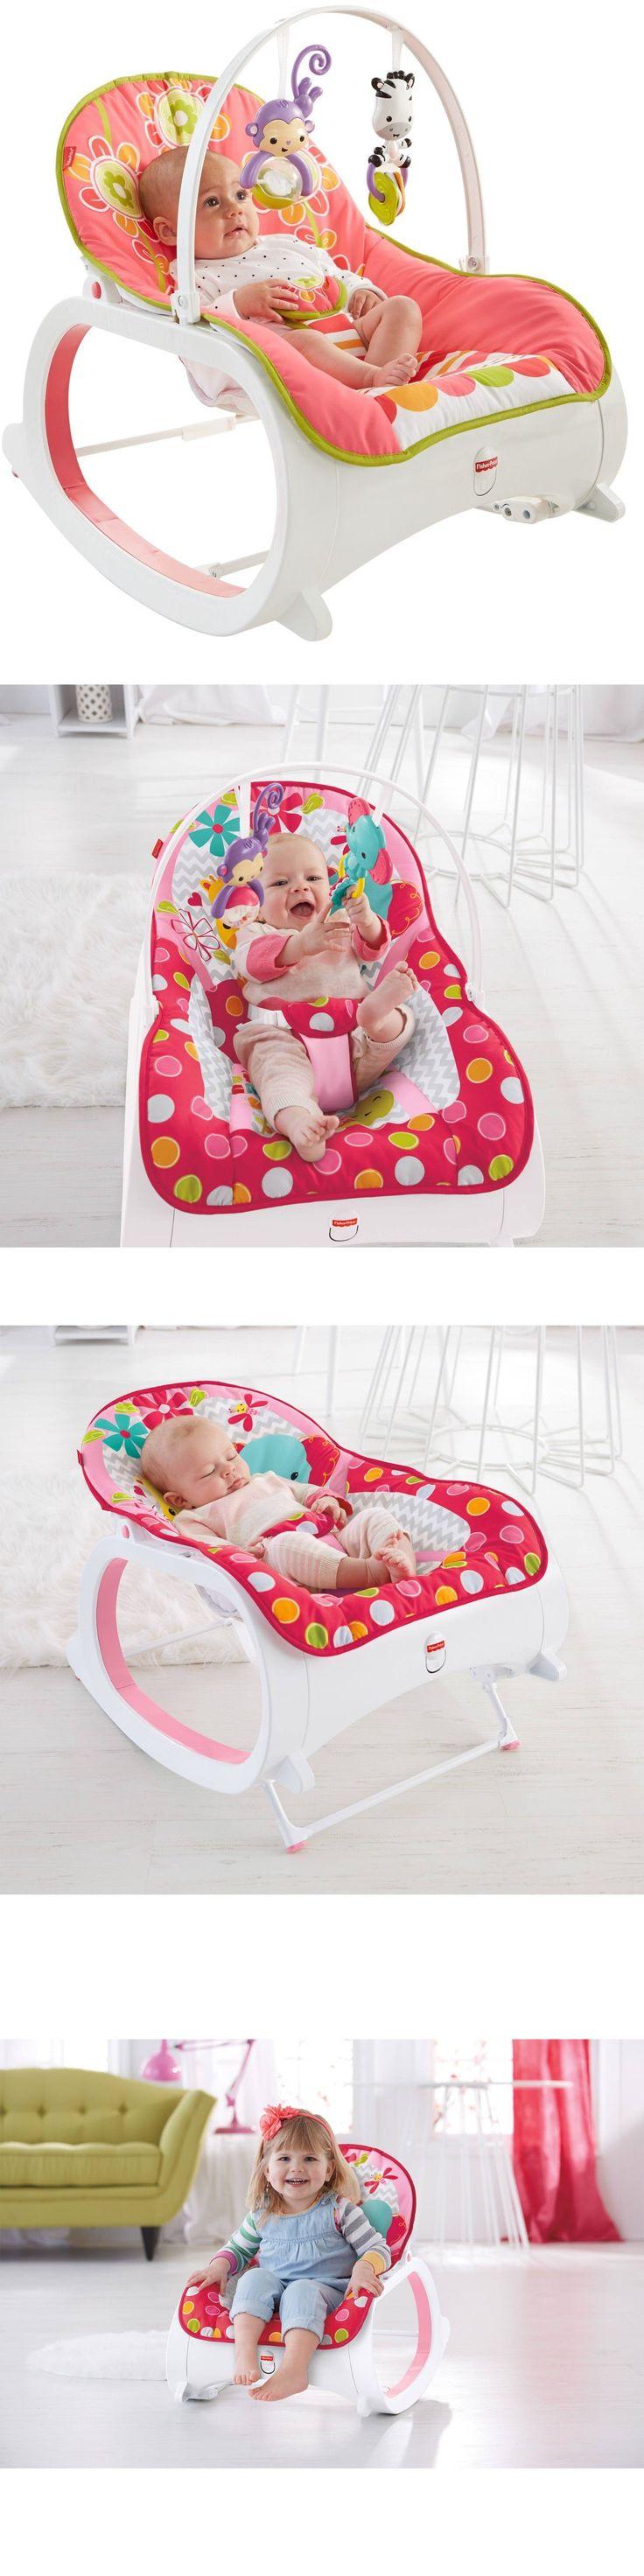 Nursery Furniture 20422: Rocking Newborn Bassinet Baby Crib Nursery Furniture Sleeper Cradle Beds Bedding -> BUY IT NOW ONLY: $49.19 on eBay!